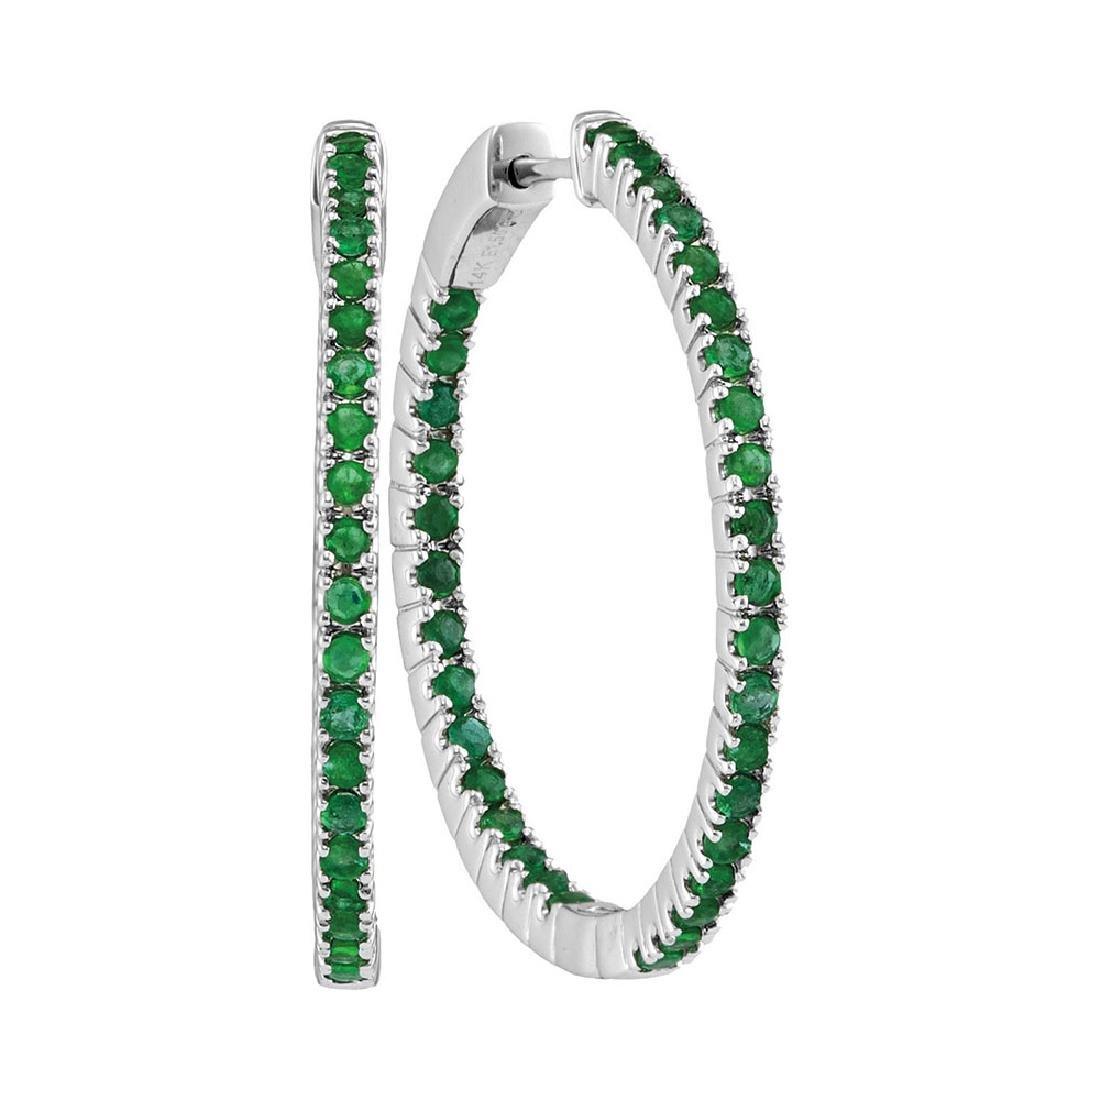 2 CTW Emerald Hoop Earrings 14KT White Gold - REF-97M4H